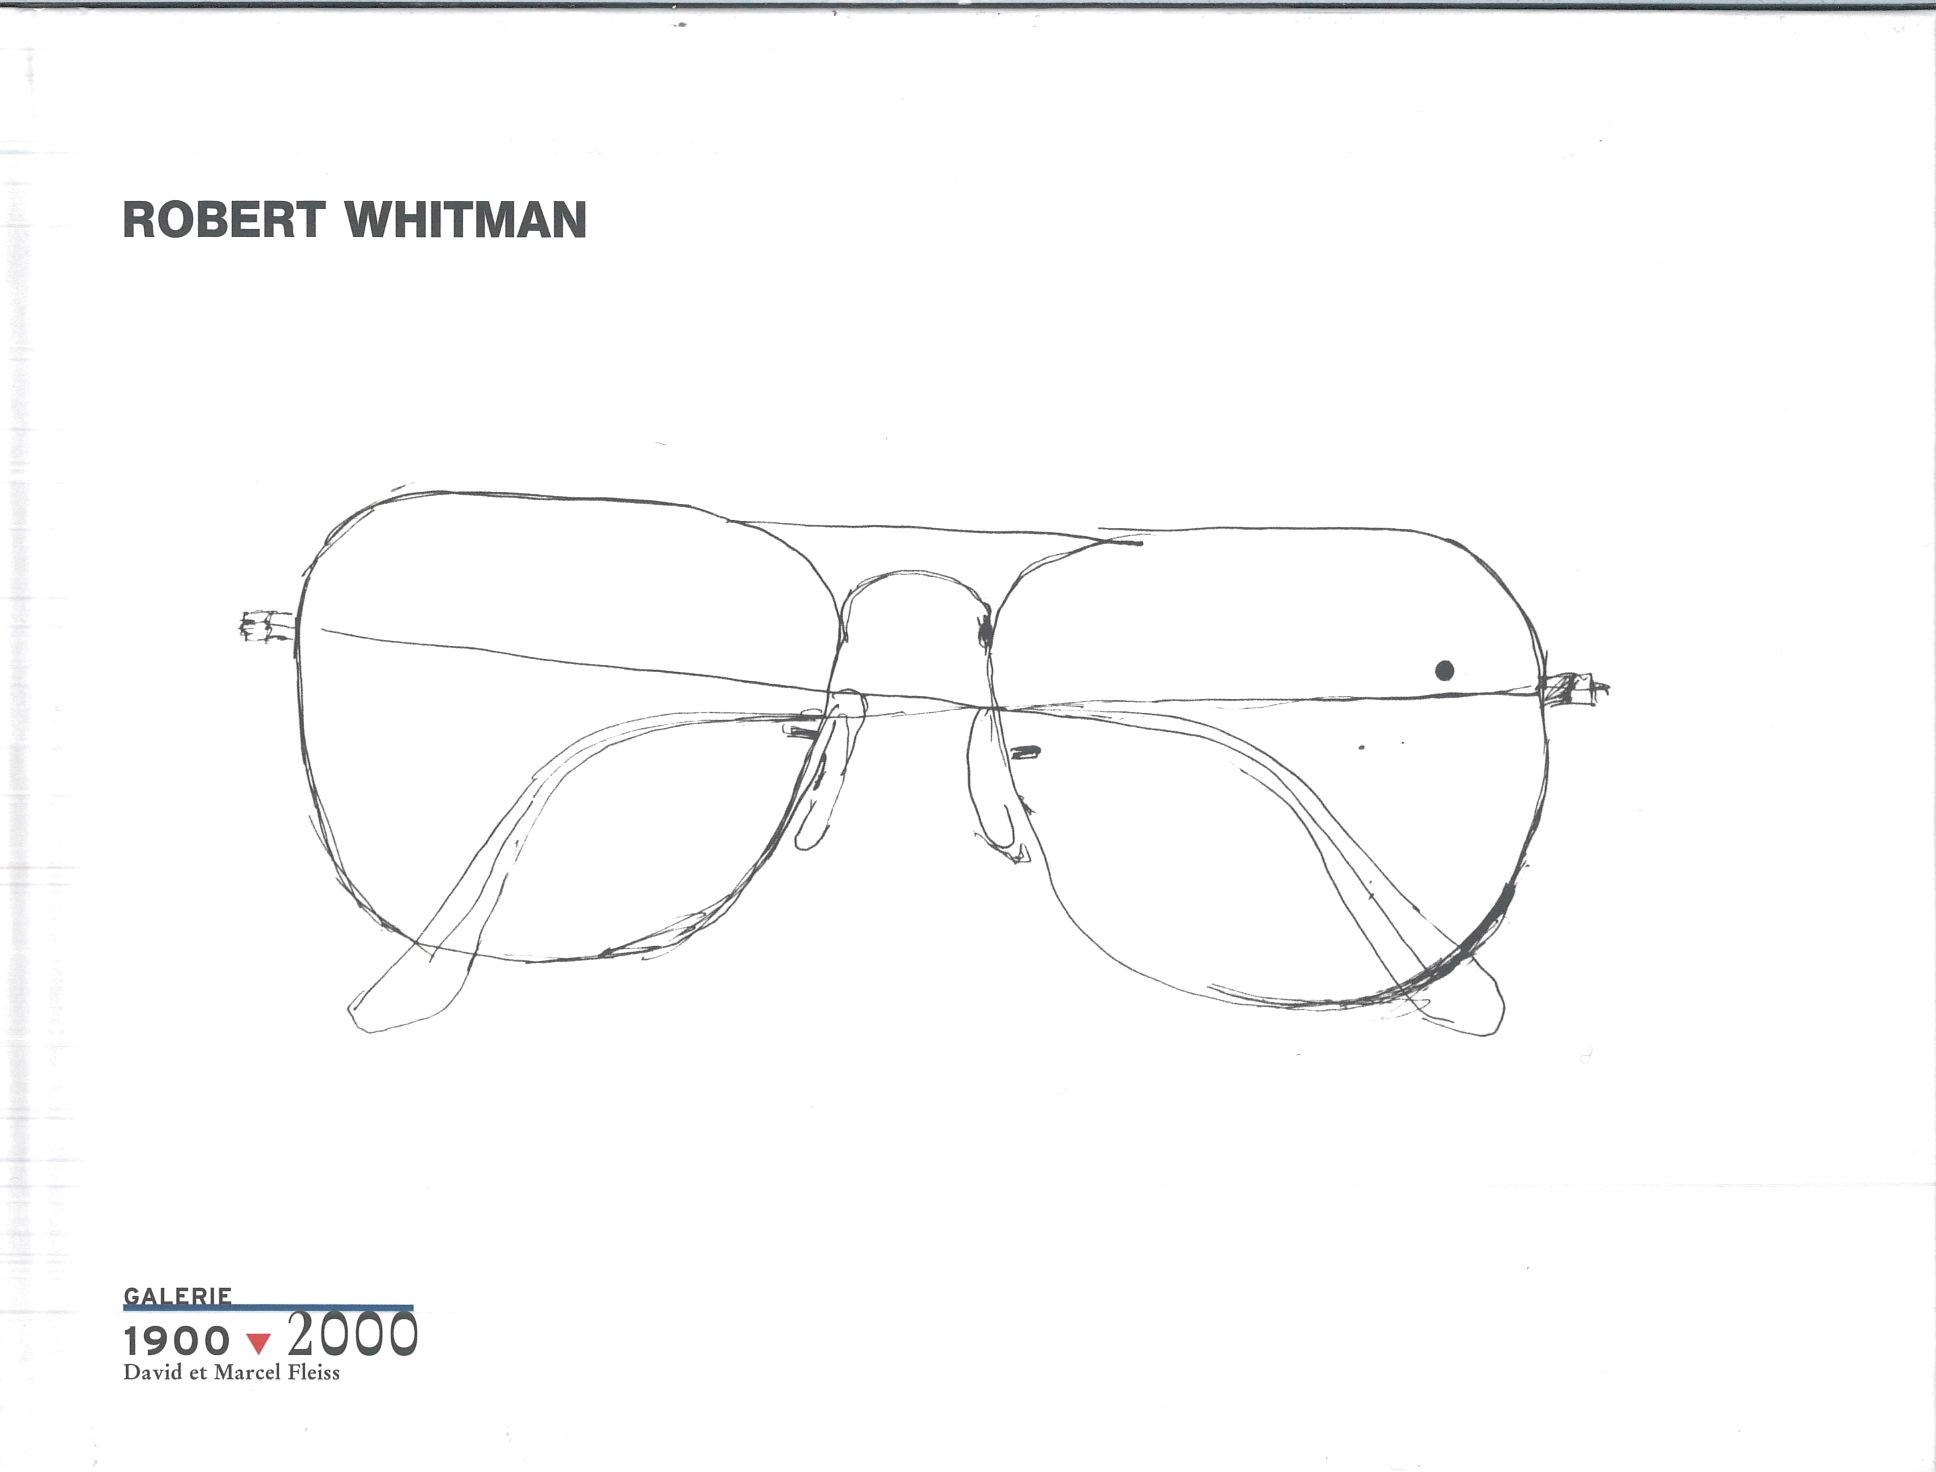 18-2-Robert-Whitman-Paris-Galerie-1900-2000-2011